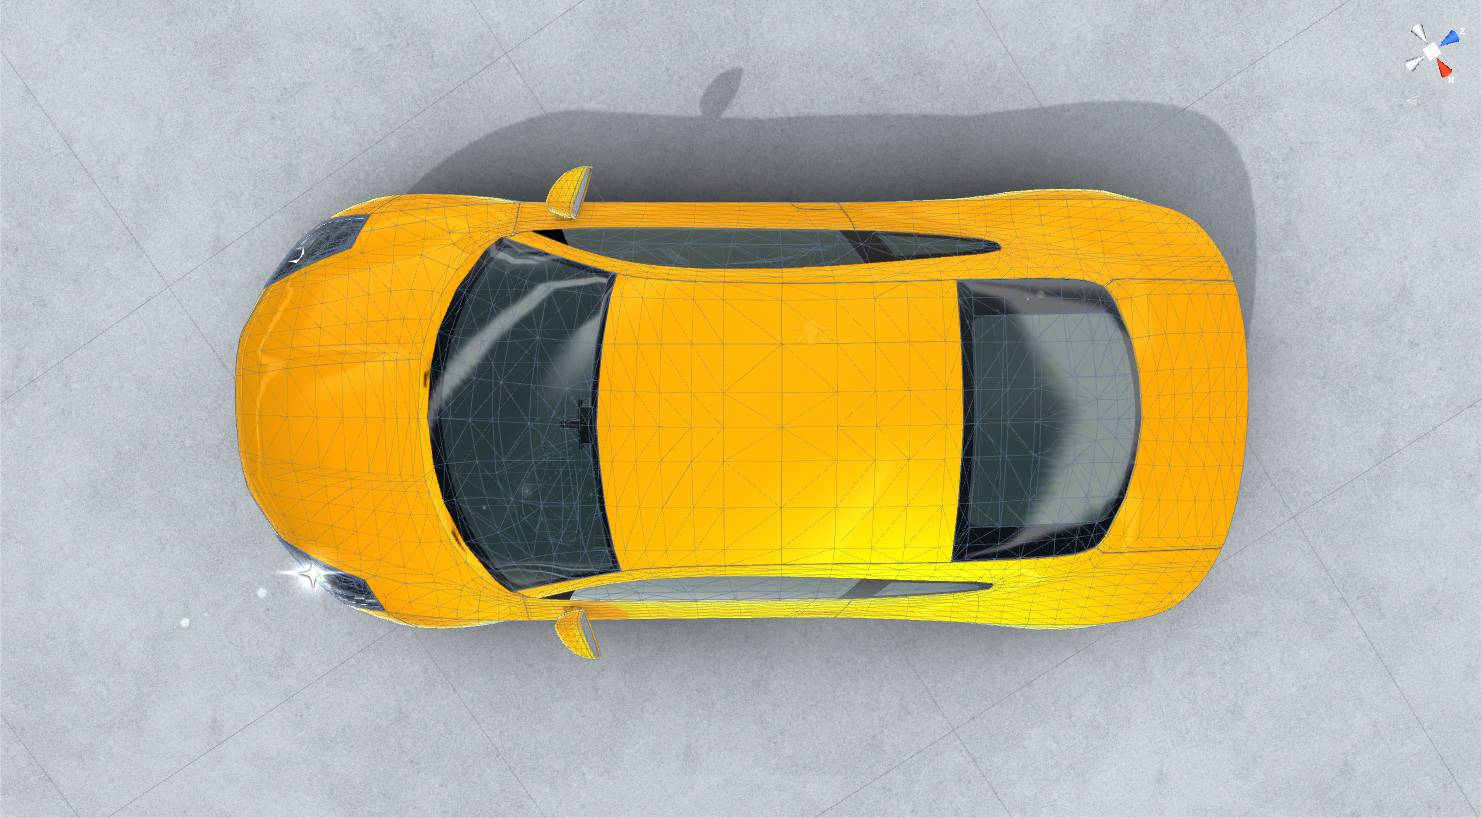 generic sports car realtime 3d model 3ds max fbx c4d lwo ma mb other obj 217746